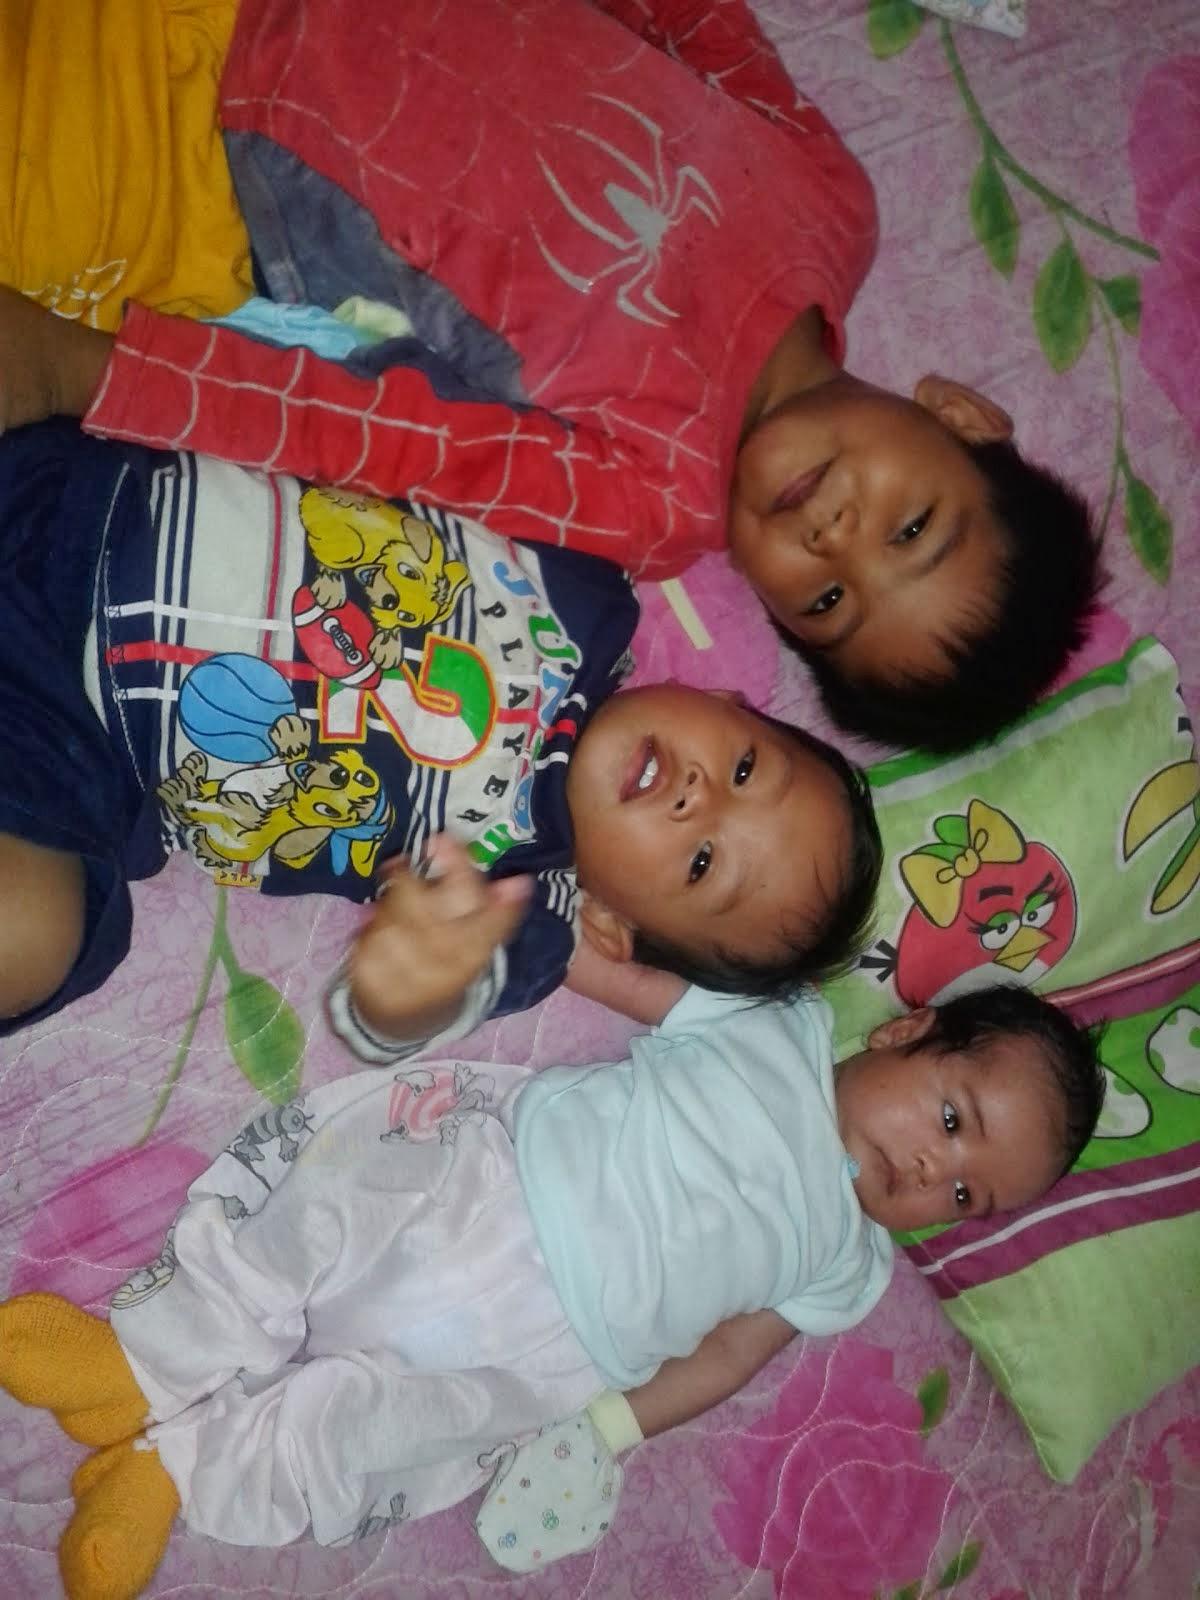 Tiga Arjuna KU